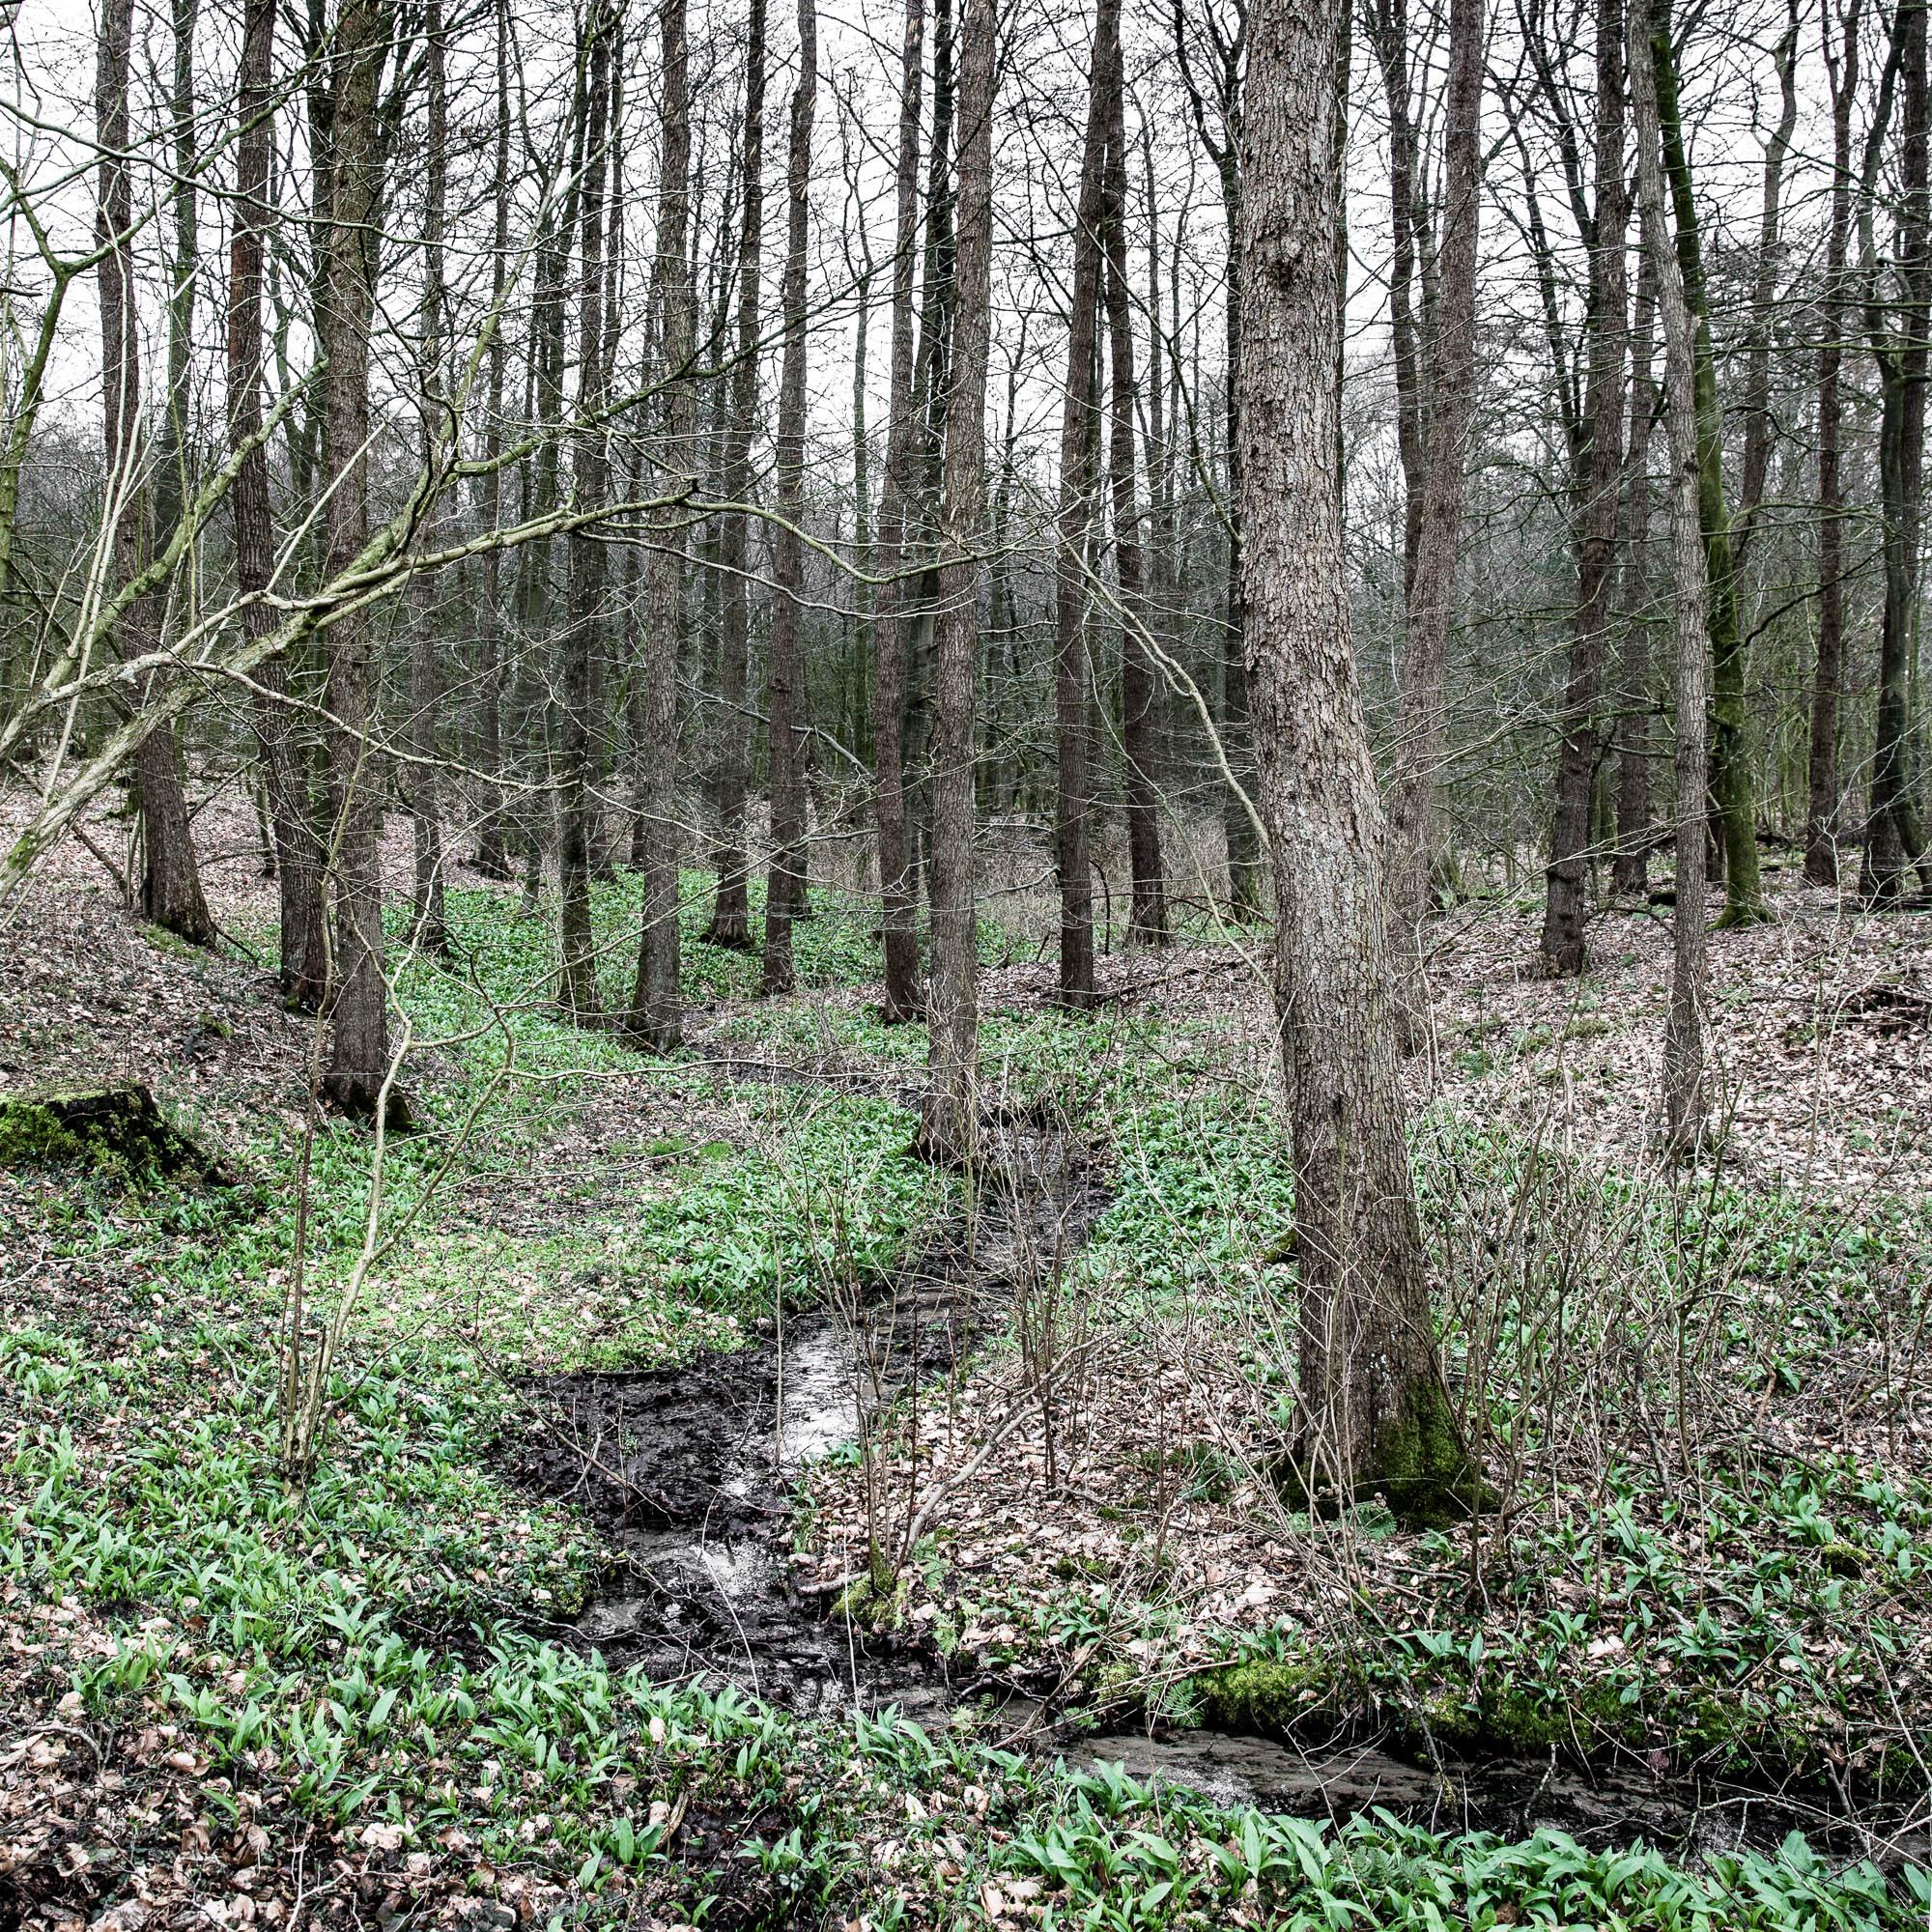 Erstes zartes Bärlauchgrün im graubraunen Frühlingwald - veggielicious | gemüse. fotos. rezepte.